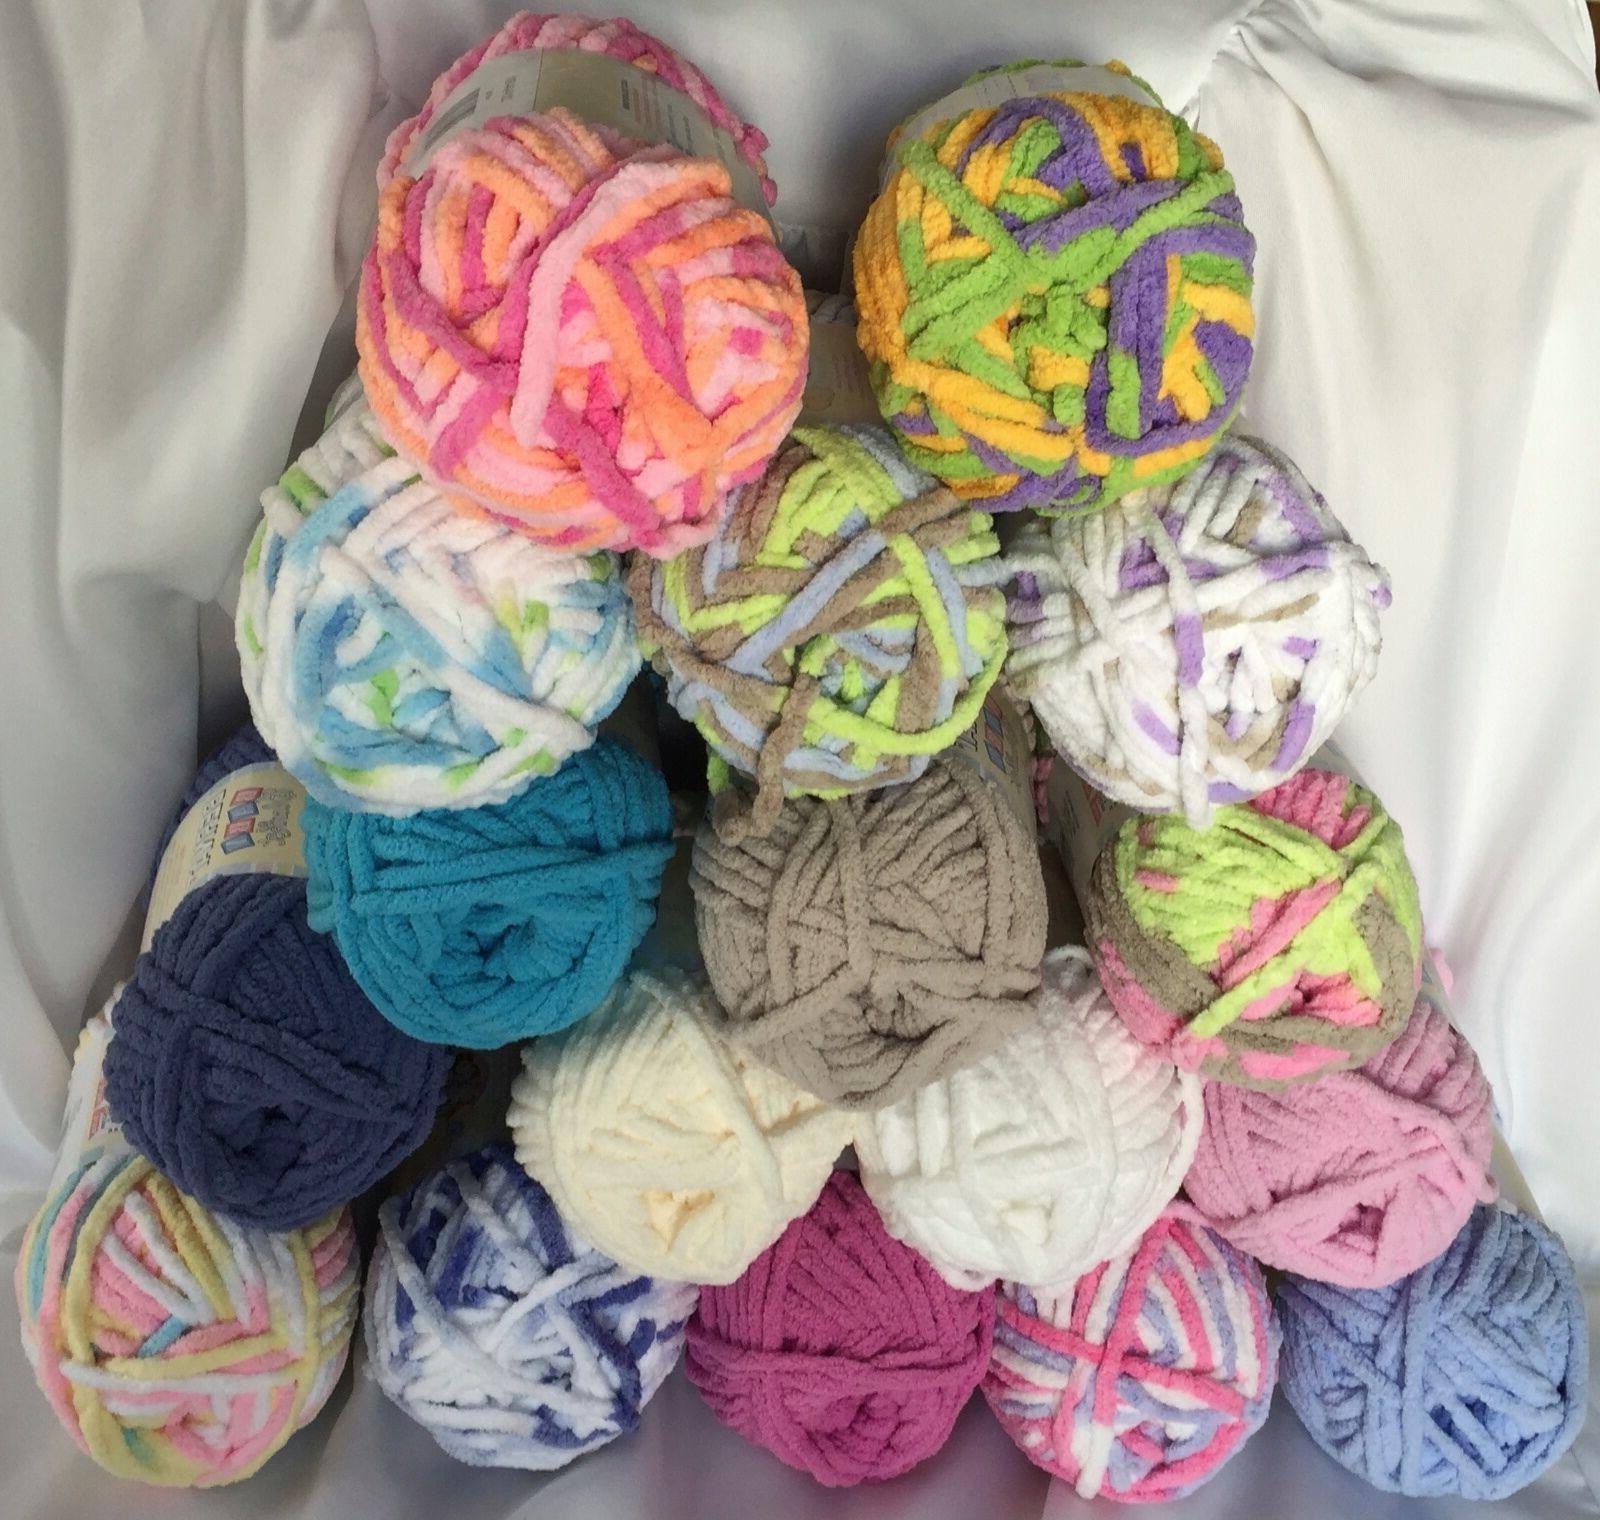 Bernat Baby Blanket Yarn 3.5 oz 100 g Skeins Large Selection